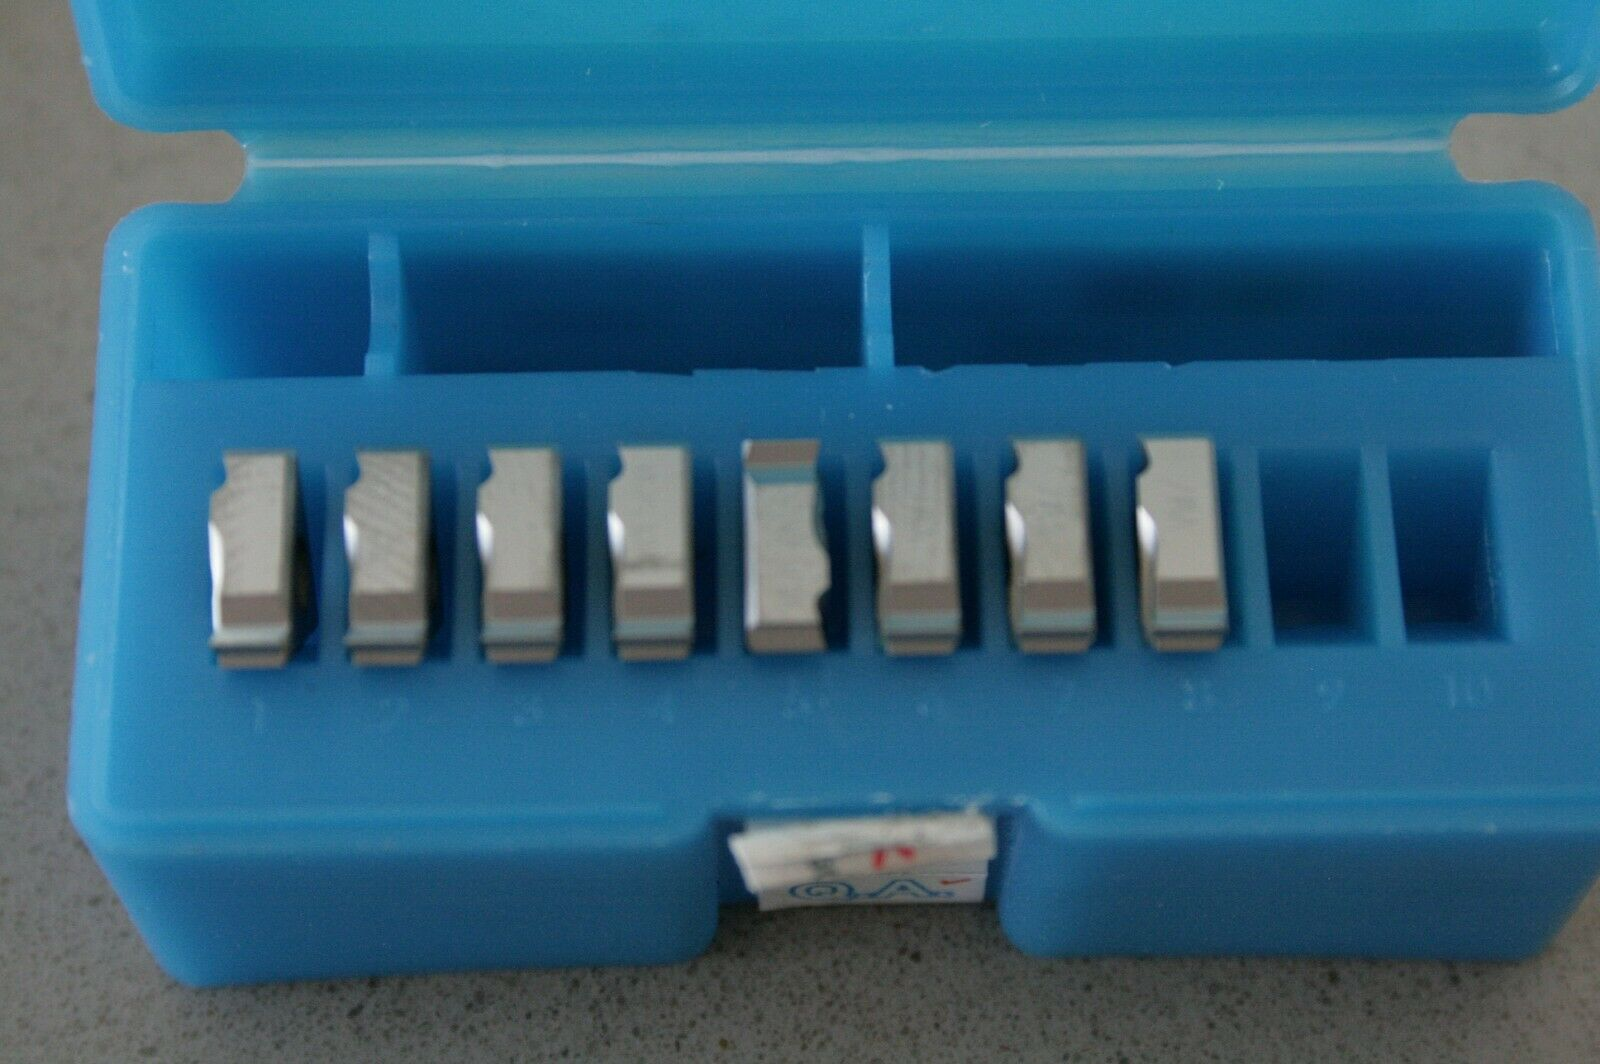 5 Vardex threading inserts 2IR A60 VTX 11IRA60 11NRA60 11NR 11IR  A 60 Deg